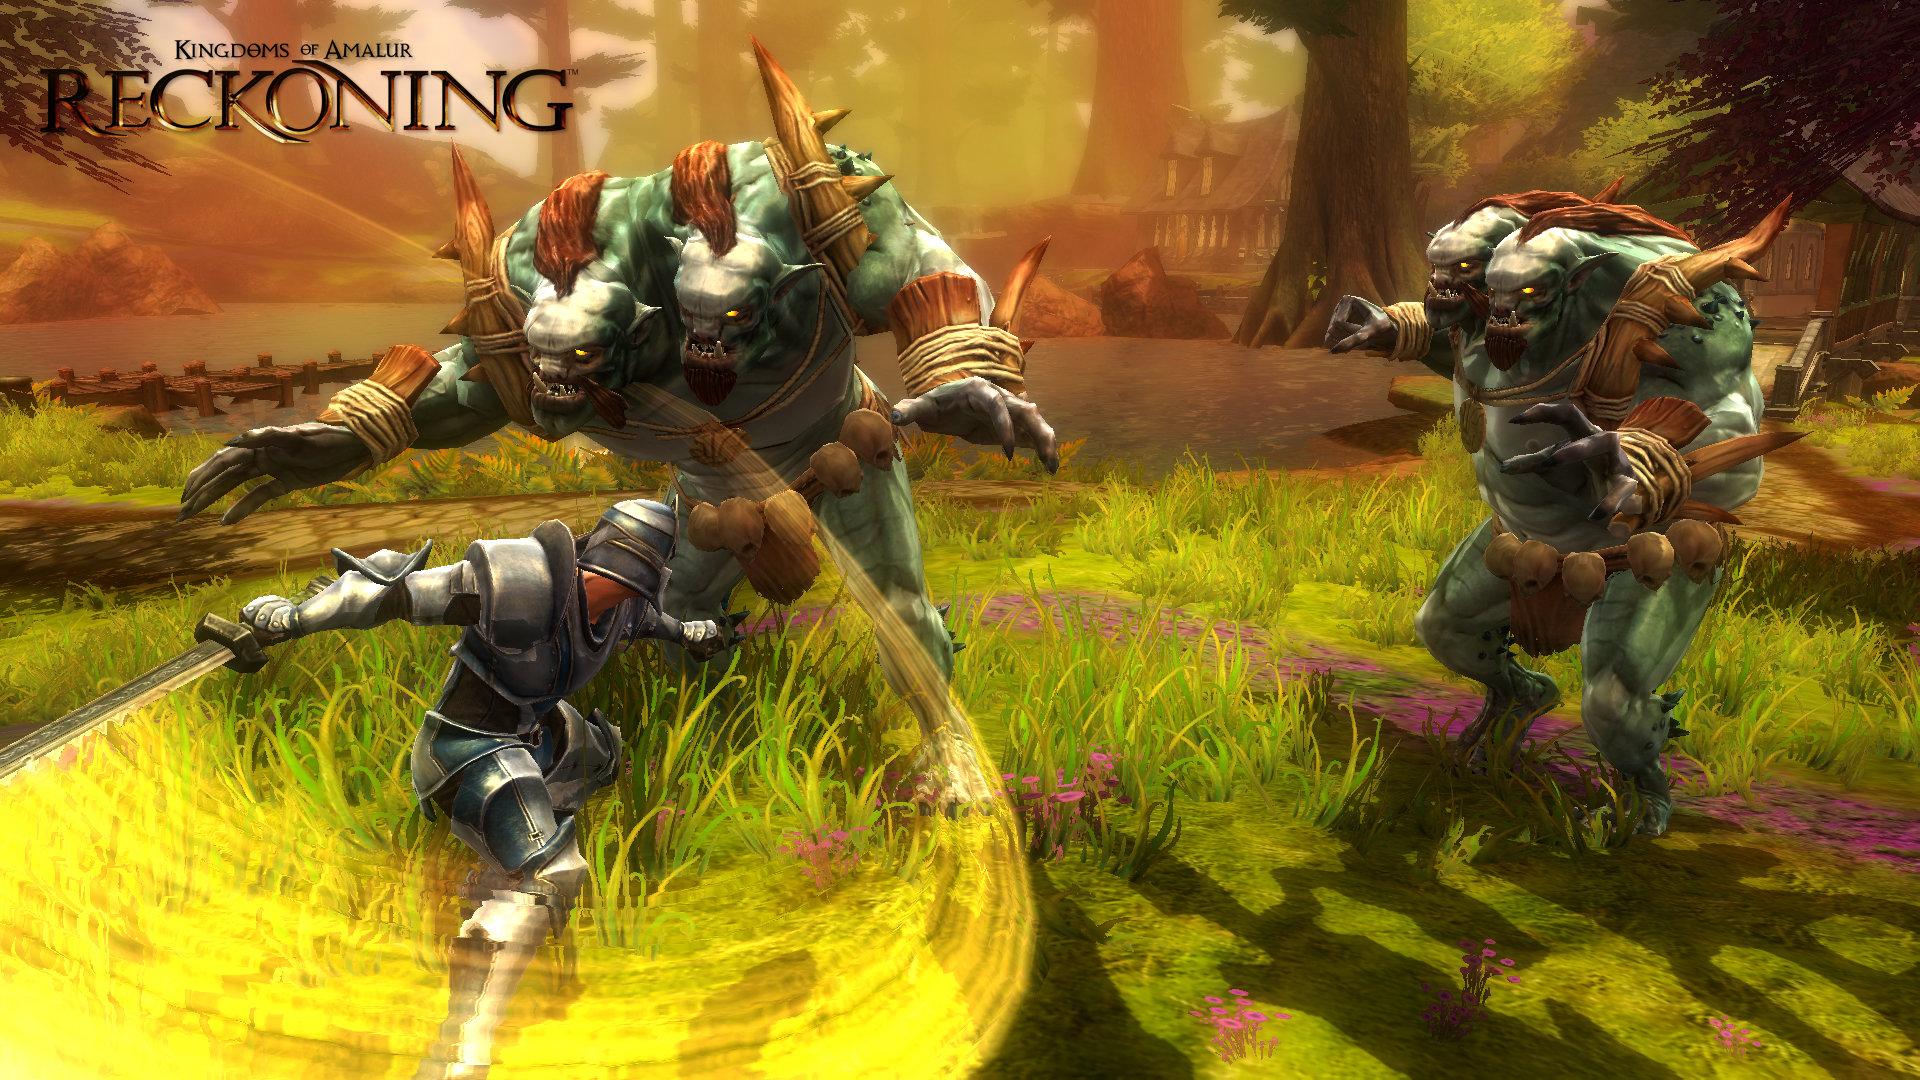 Ettin Battle (gamescom) – 25.08.2011